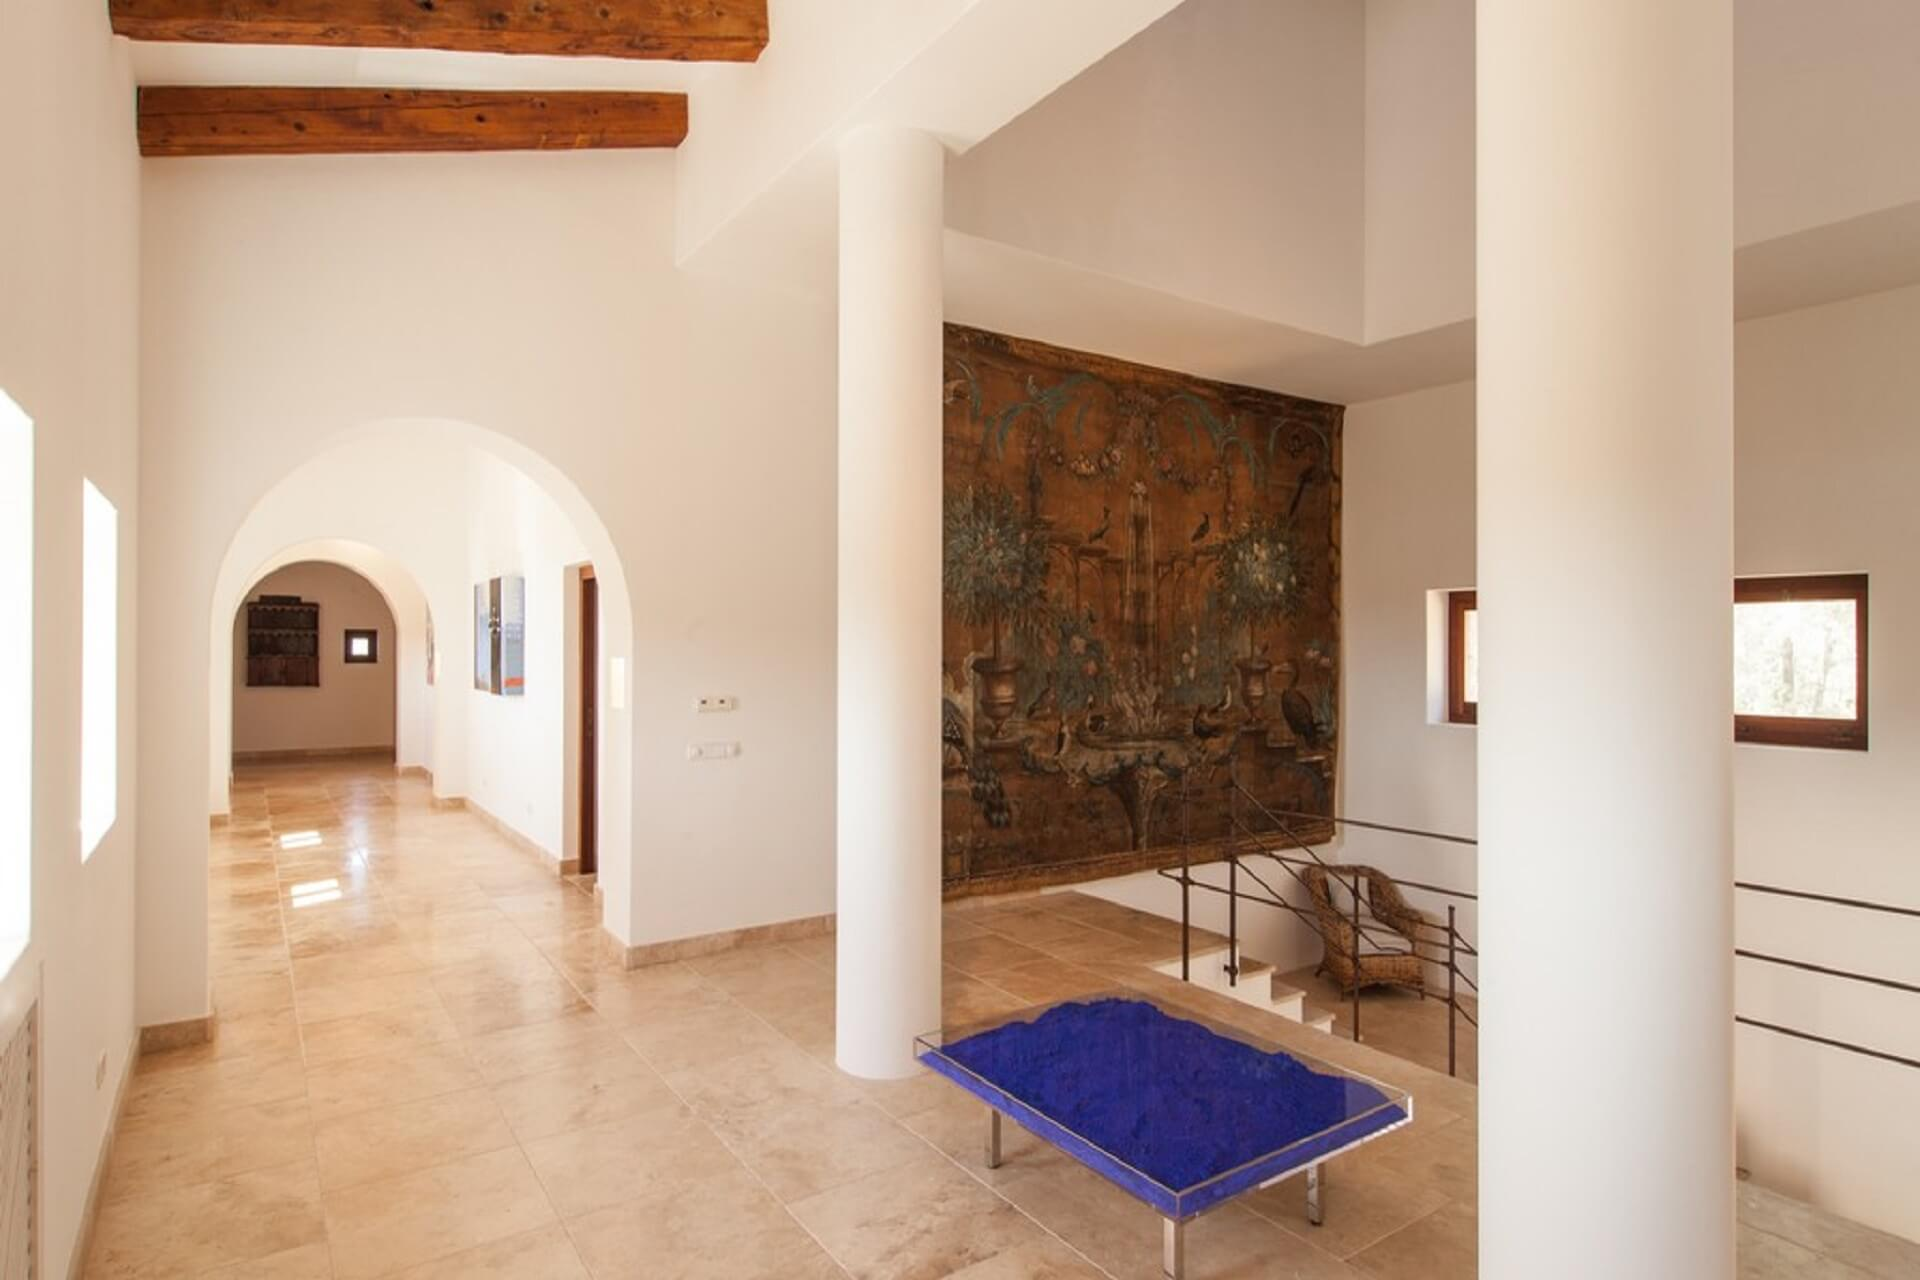 VILLA CASA TUCAN - Corridor first floor